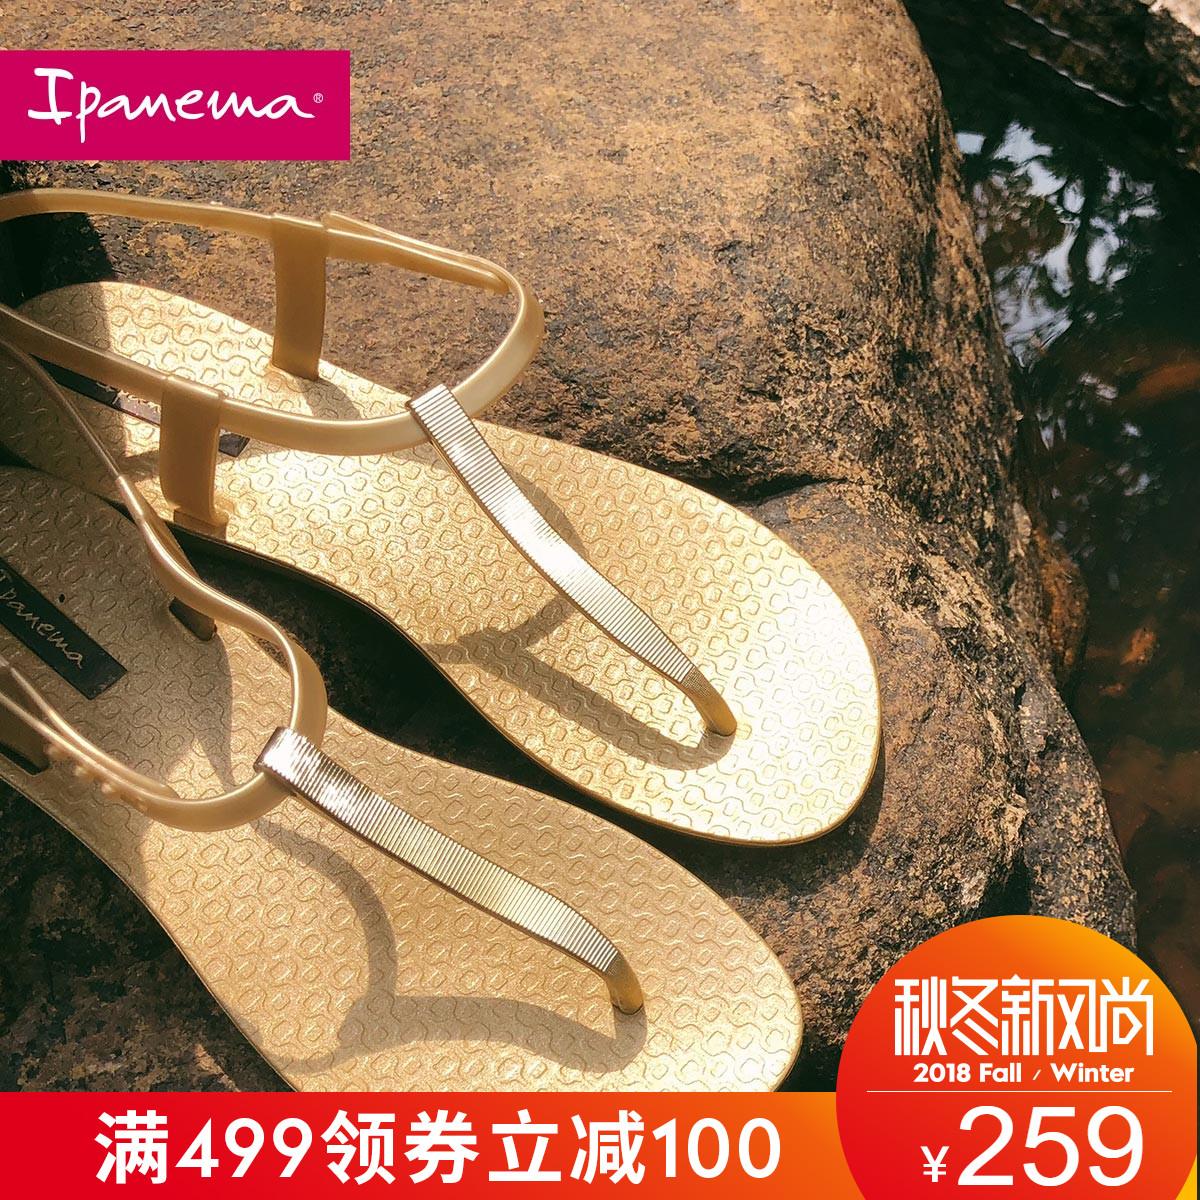 Ipanema巴西凉鞋女2018新款夏季平底时尚罗马女鞋夹脚沙滩鞋软底